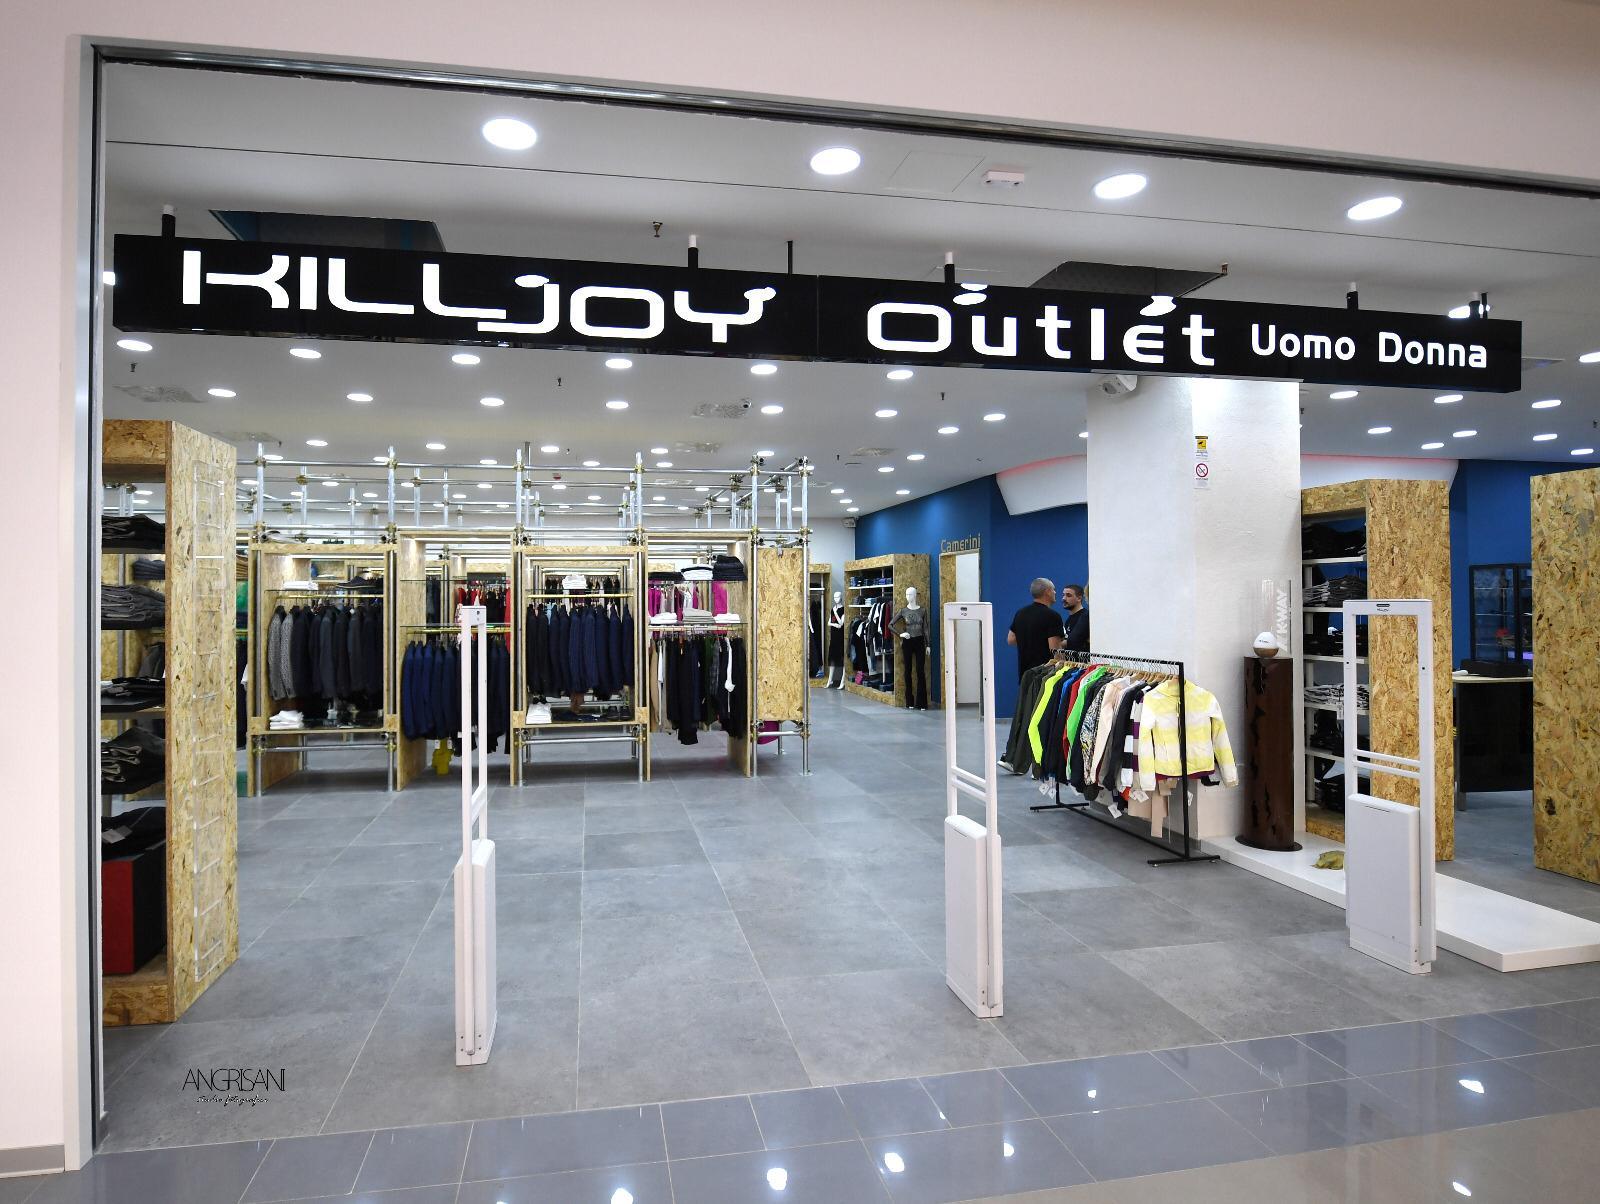 Kill Joy Outlet - Salerno Luci d\'Artista 2019-20